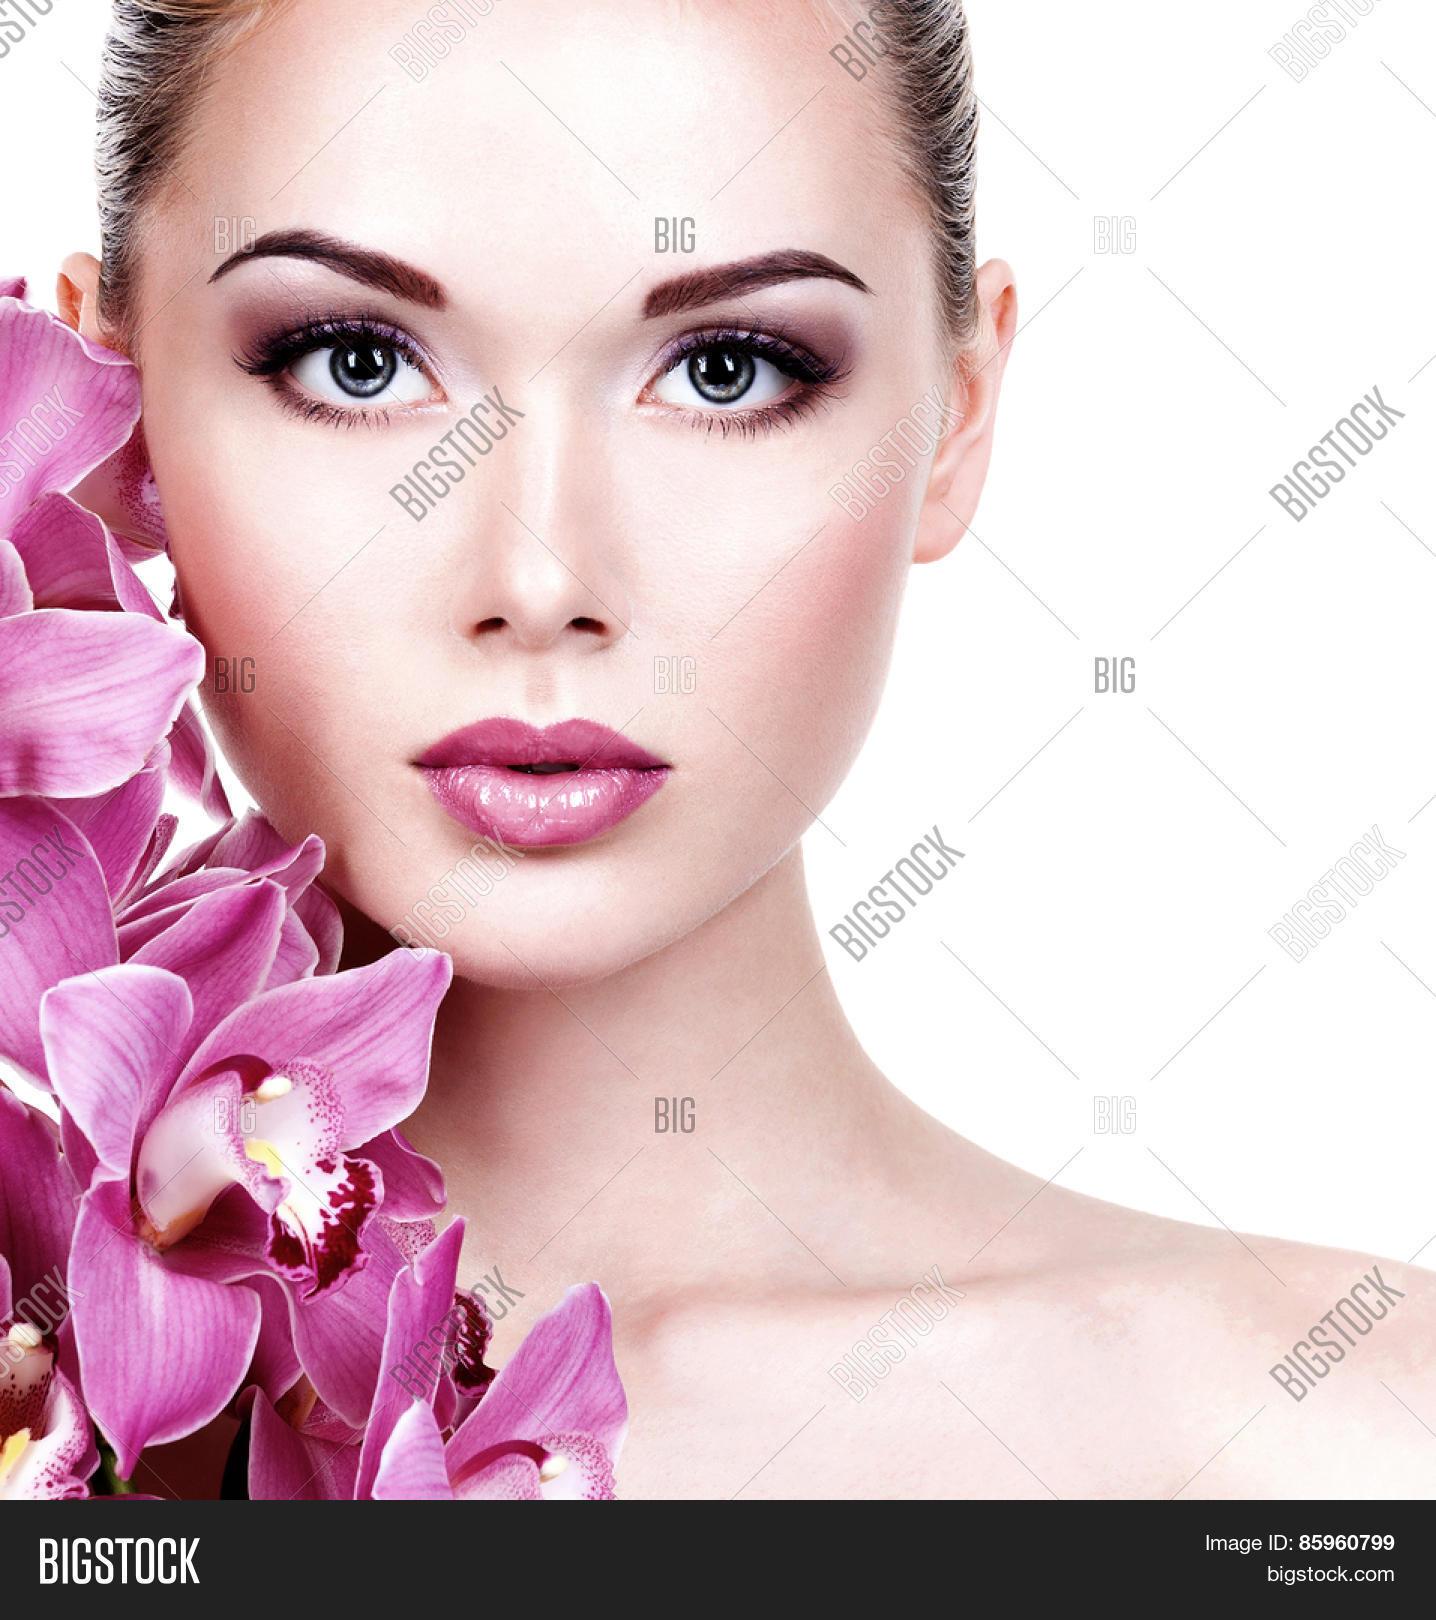 Lipstick Pretty Girl Faces: Closeup Face Young Beautiful Woman Image & Photo